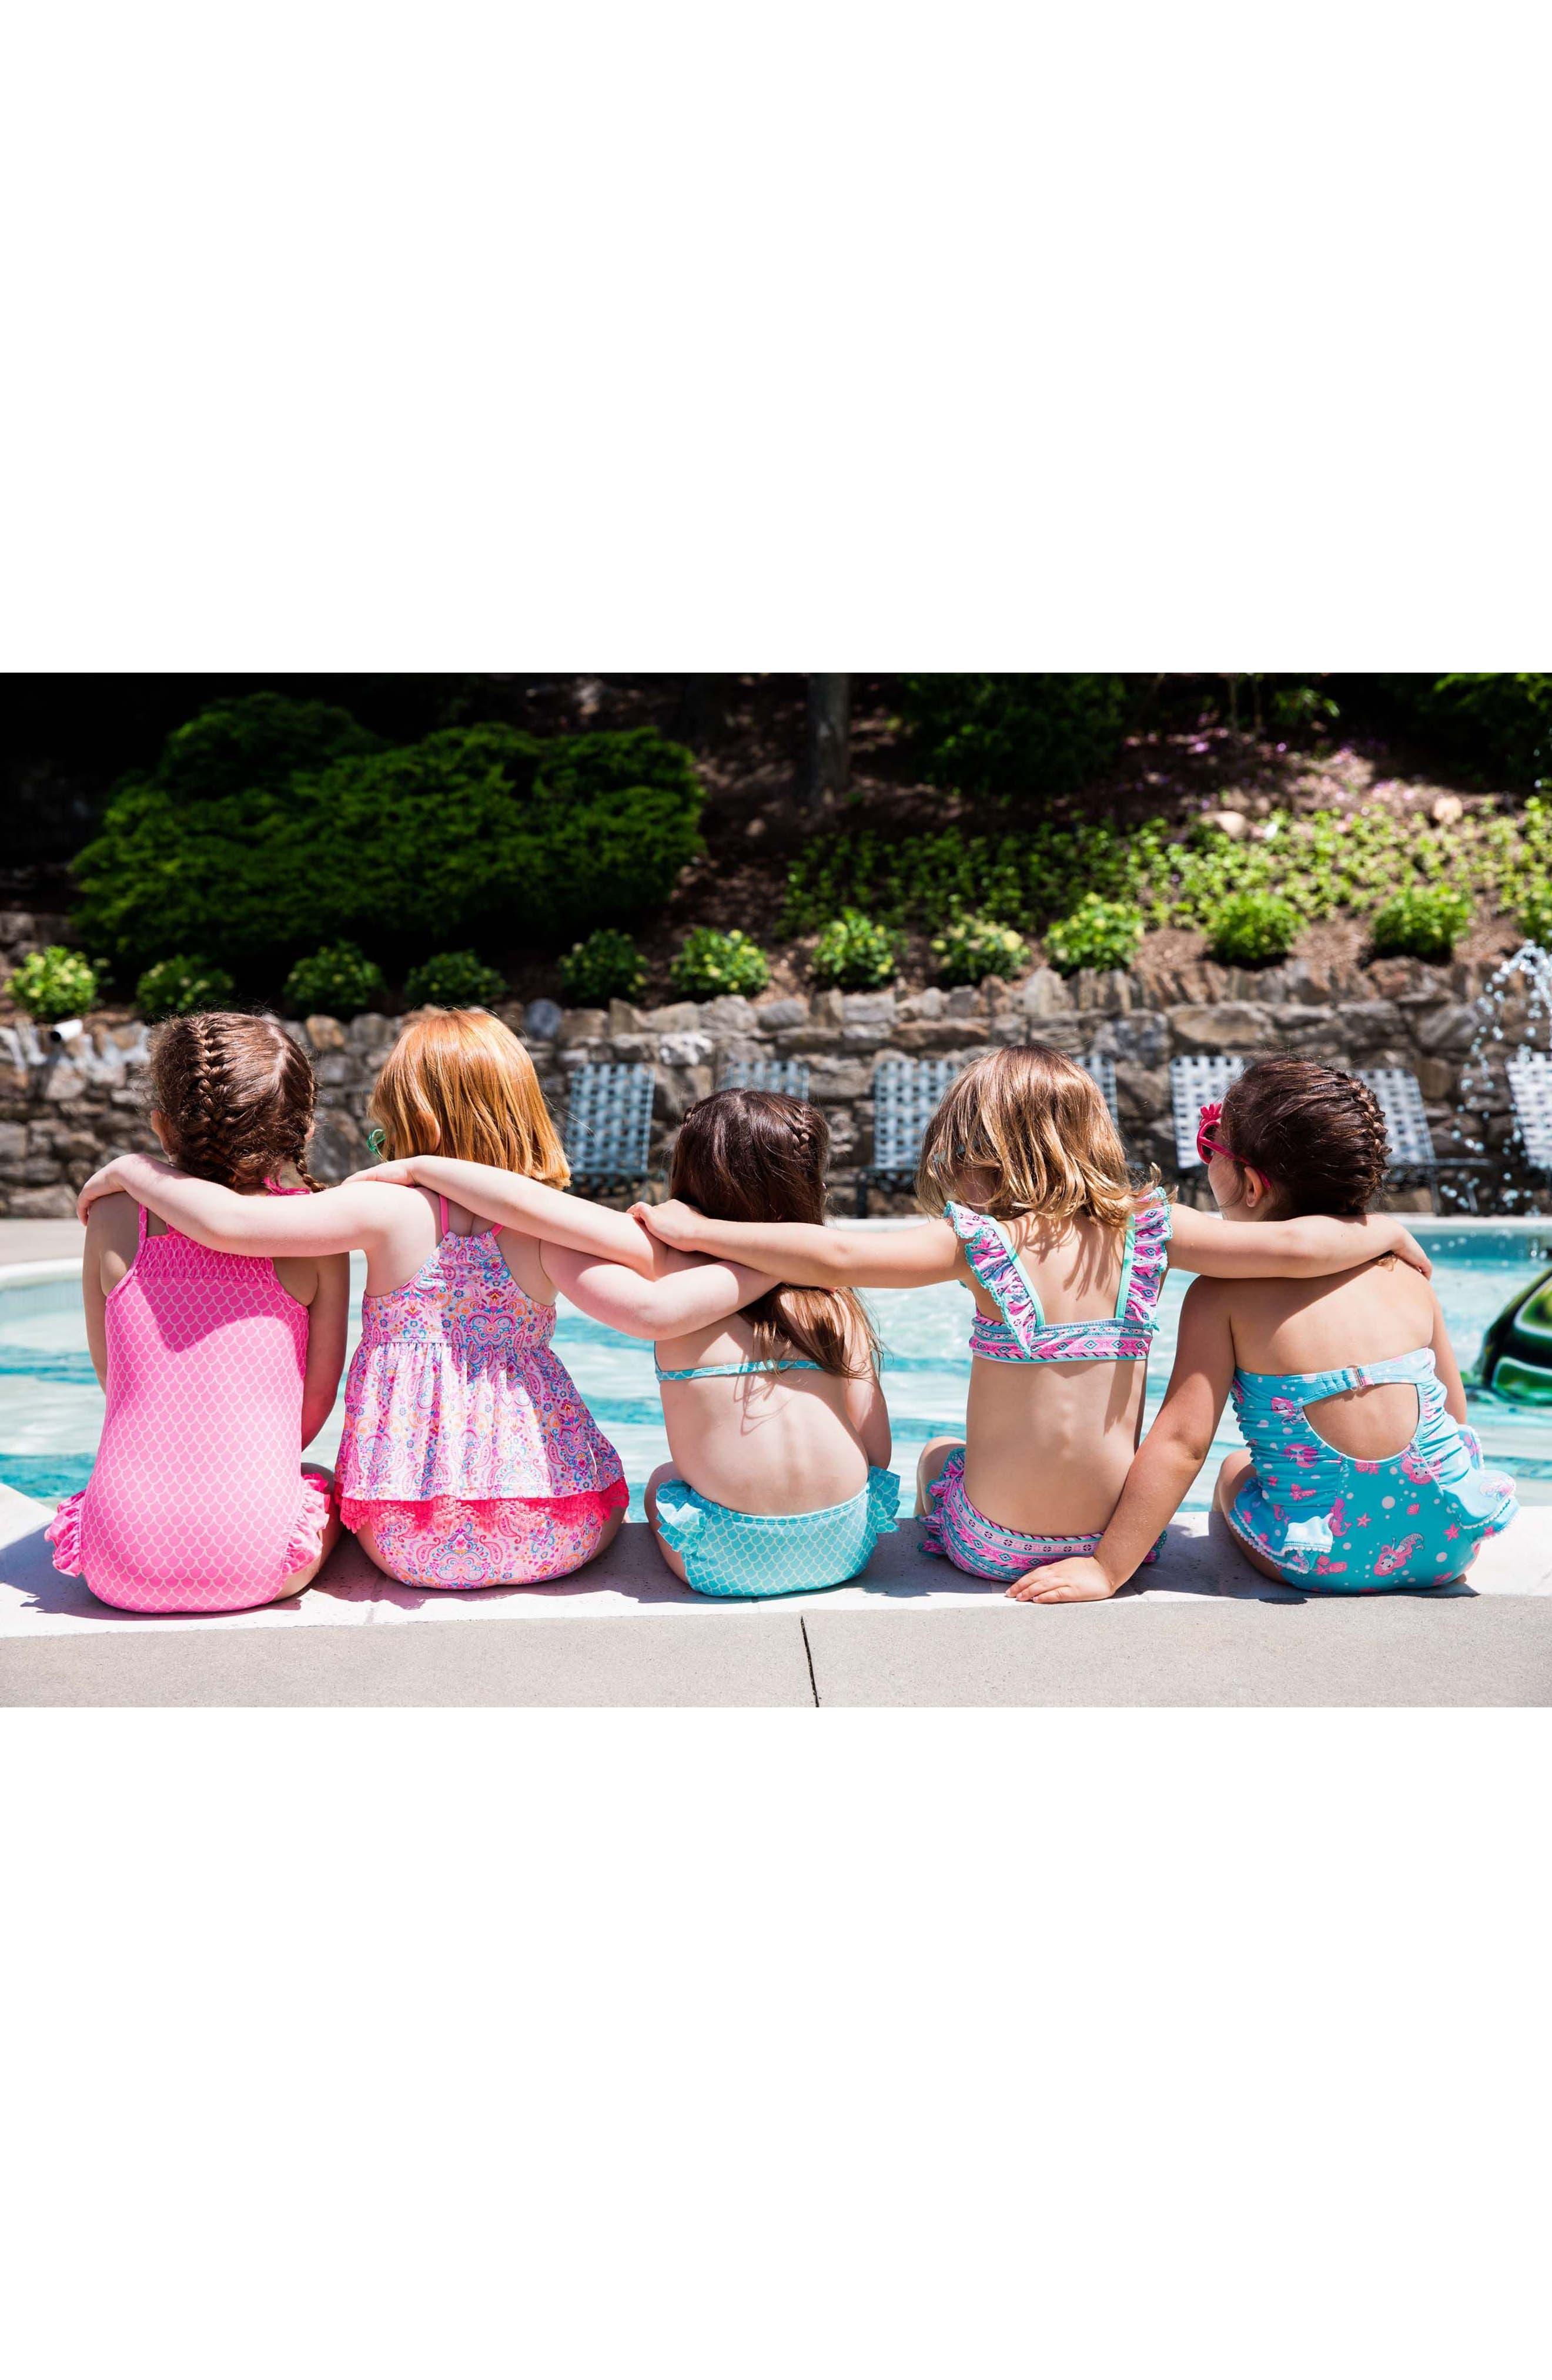 Alternate Image 3  - Hula Star Mermaid Princess One-Piece Swimsuit (Toddler Girls & Little Girls)